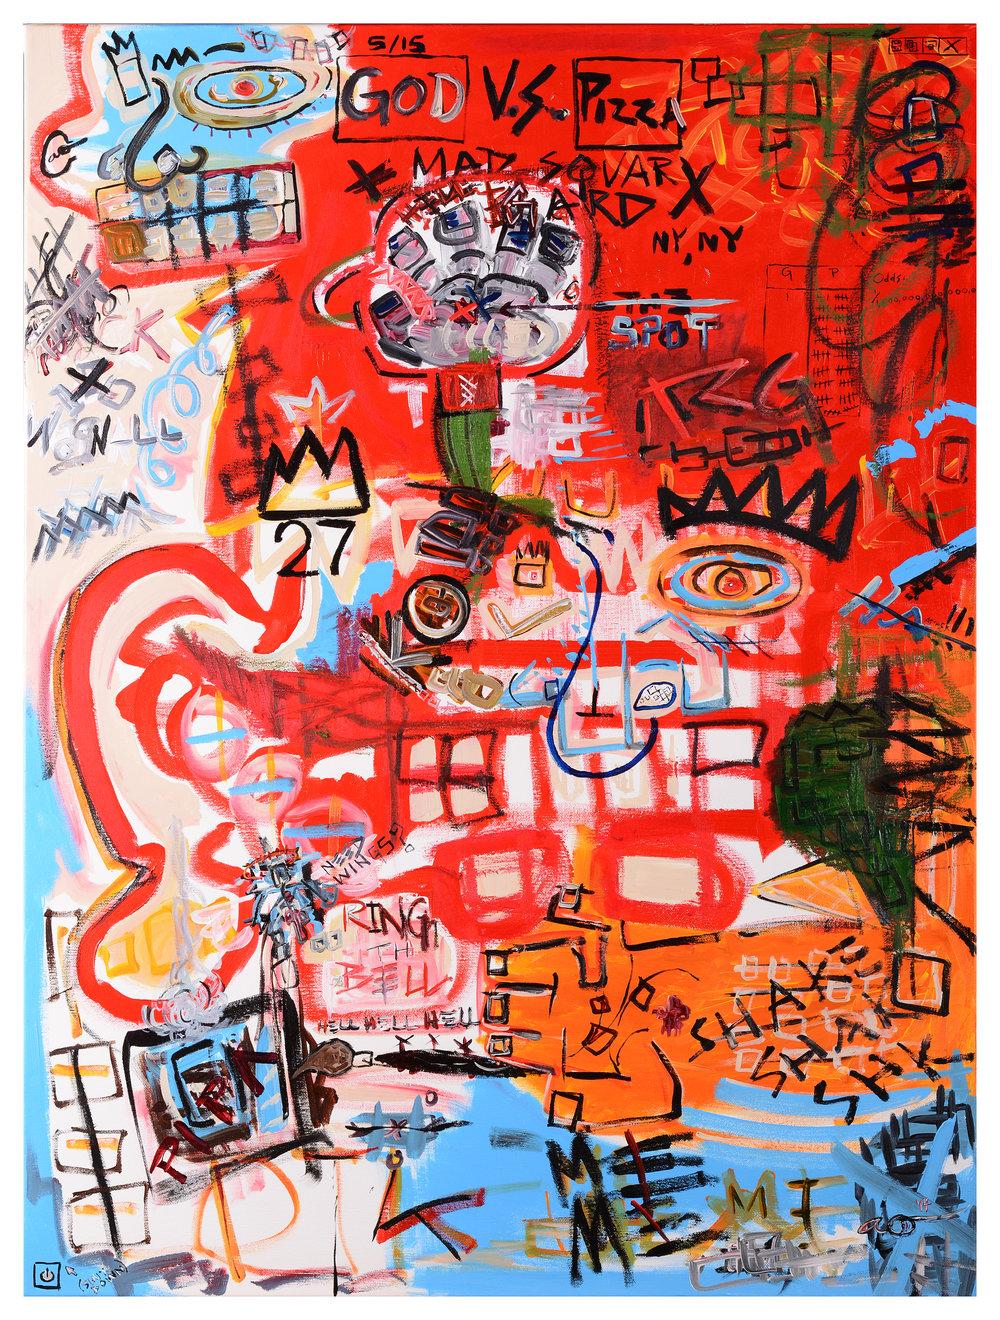 Self-Portrait IV - Red Man